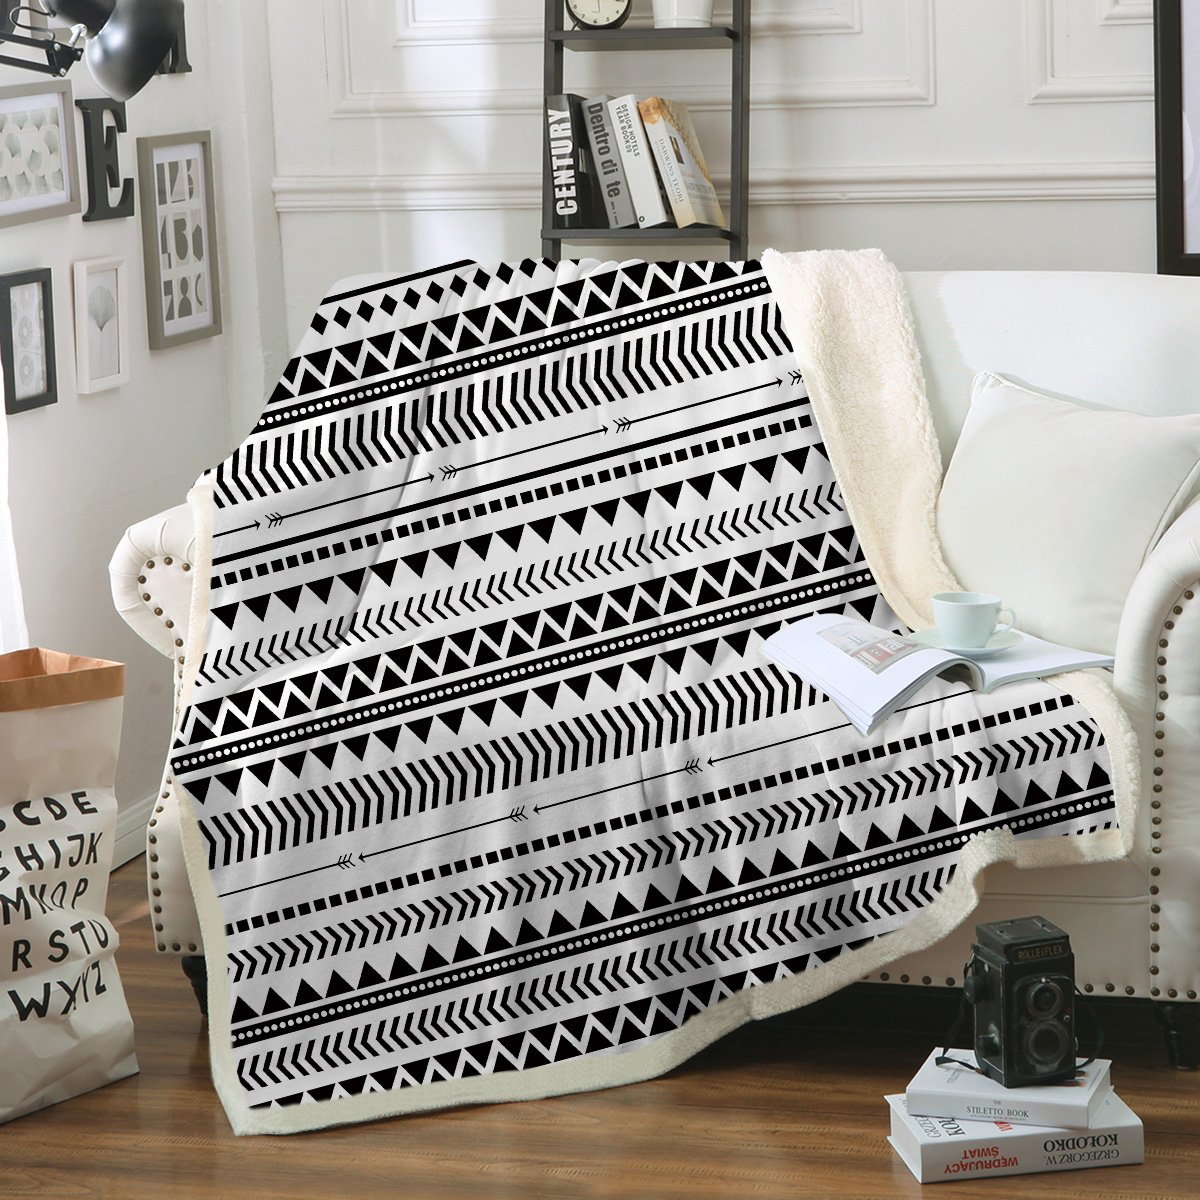 Groovy Sleepwish Aztec Throw Blanket Black White Triangle Blanket Tribal Geometric Fleece Sherpa Throw Blanket For Couch Bed Sofa 60 X 80 Inch Creativecarmelina Interior Chair Design Creativecarmelinacom